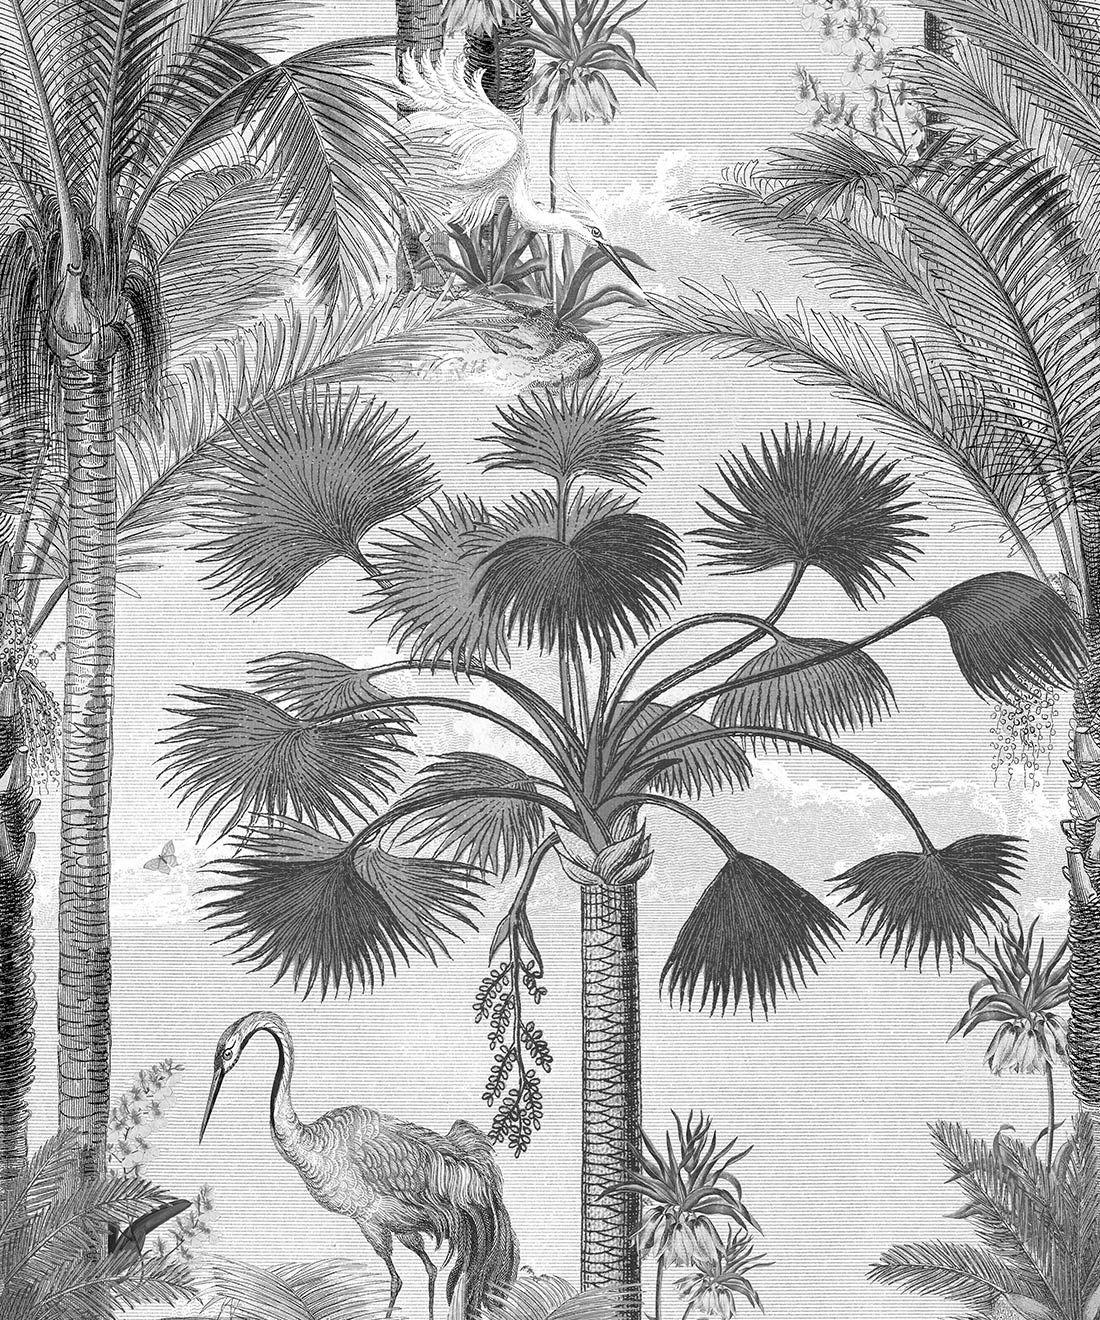 Kerala Palms Wallpaper Mural •Bethany Linz • Palm Tree Mural • Black & White • Swatch